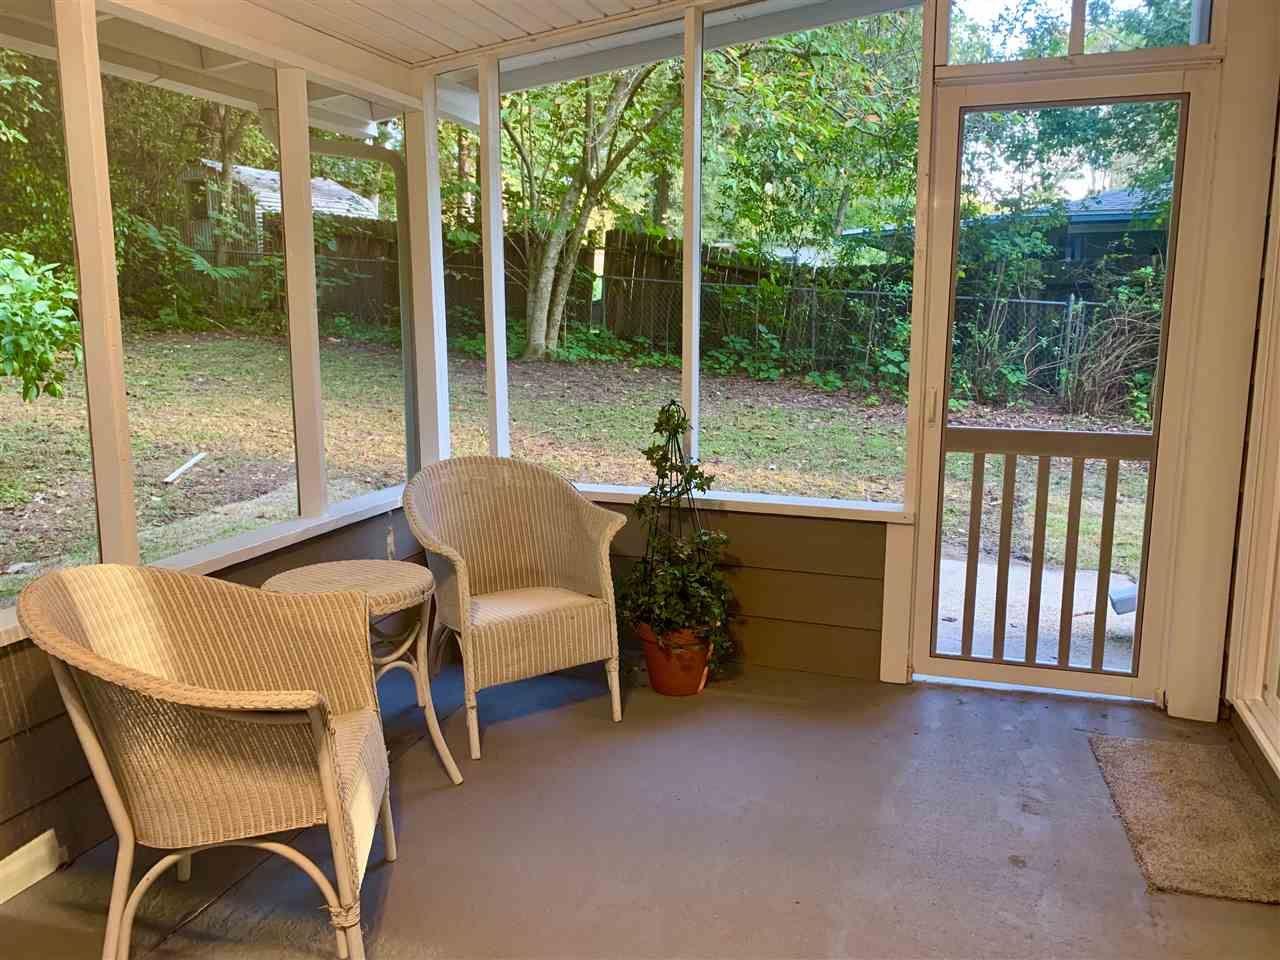 Photo of 1115 Missionwood Lane (near San Luis), TALLAHASSEE, FL 32303 (MLS # 324366)